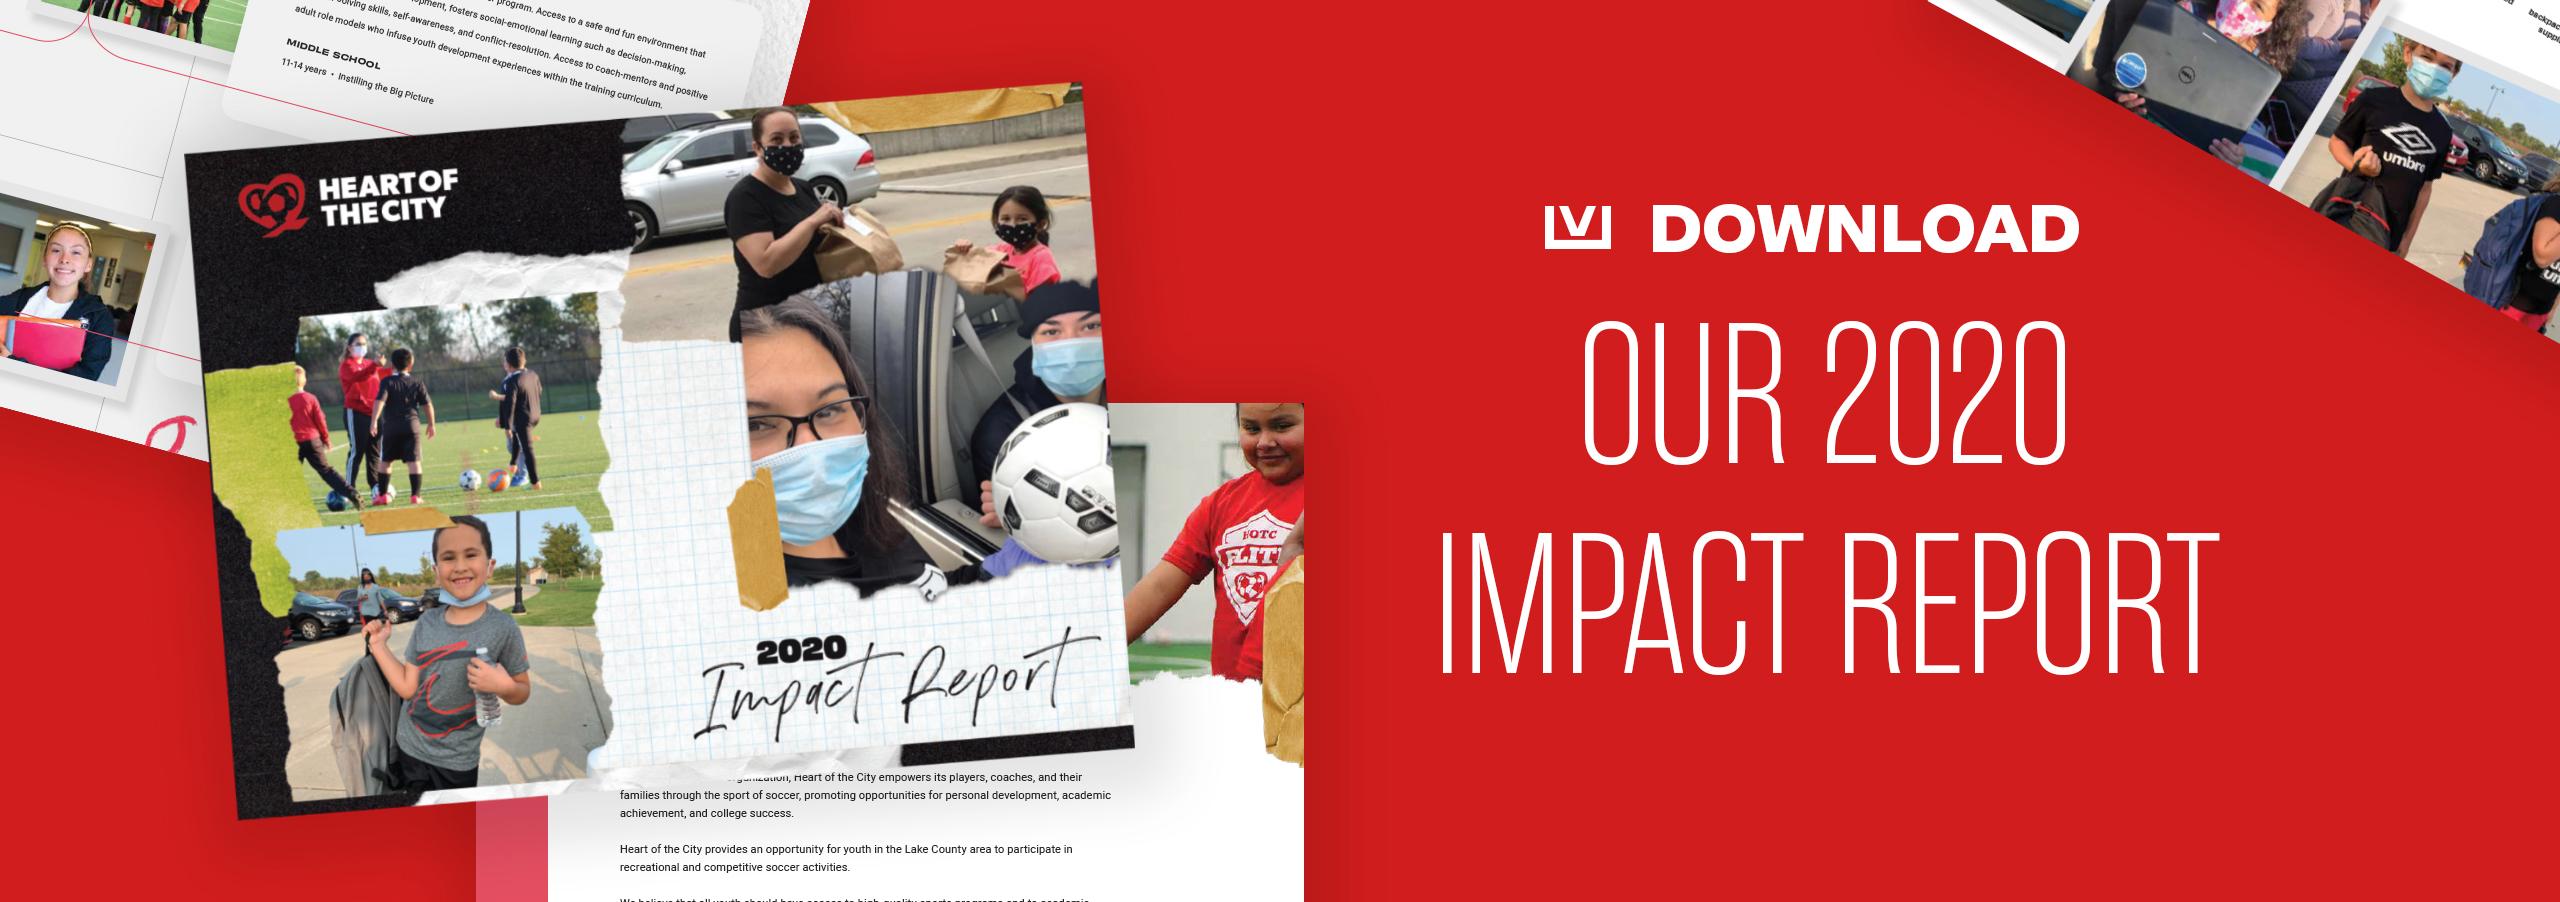 HOTC_2020_Impact_Report_Banner_Long